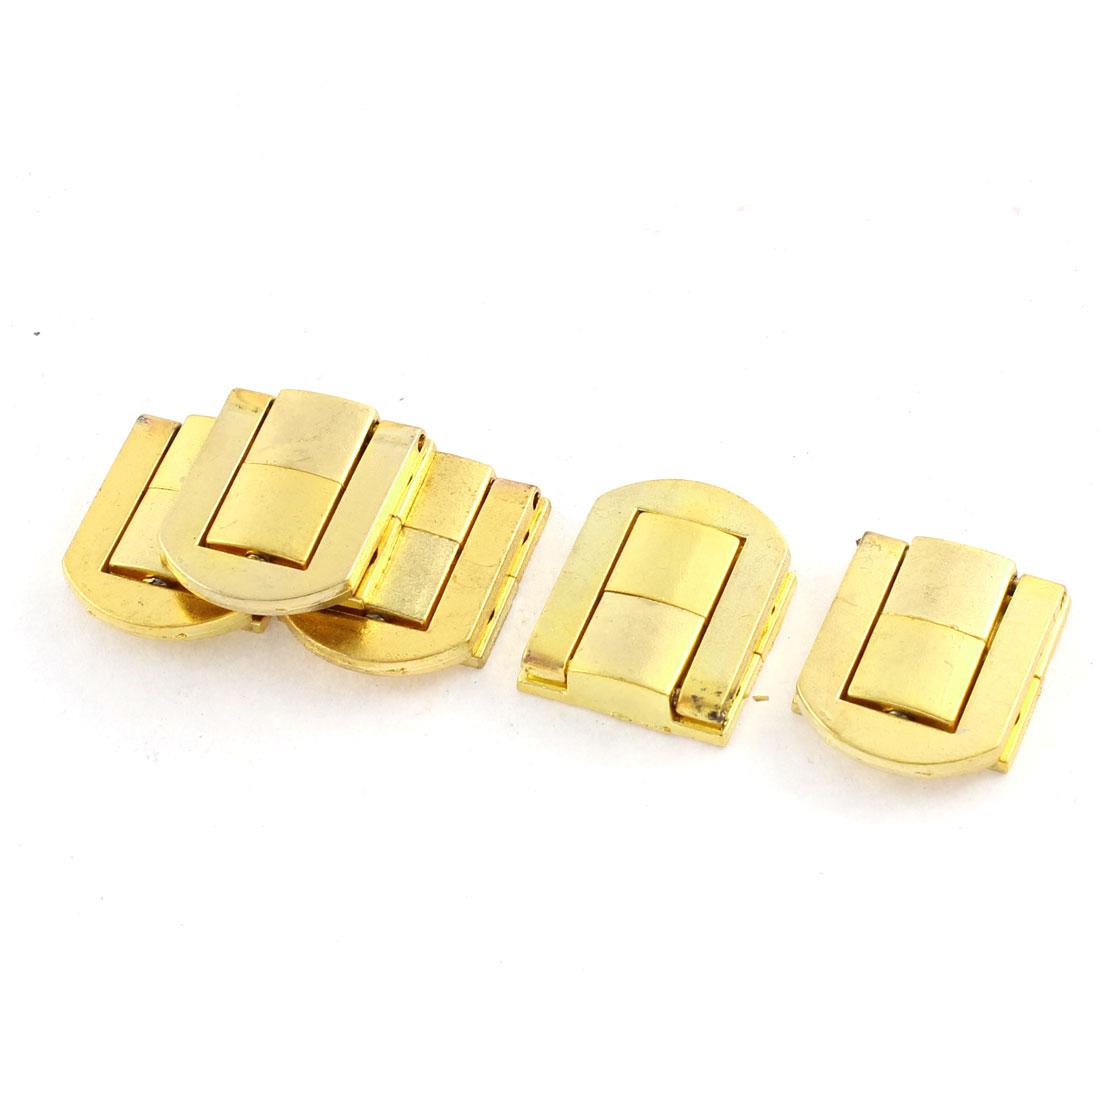 5pcs 25mmx21mm Gold Tone Zinc Alloy Suitcase Box Lid Hidden Hole Latch